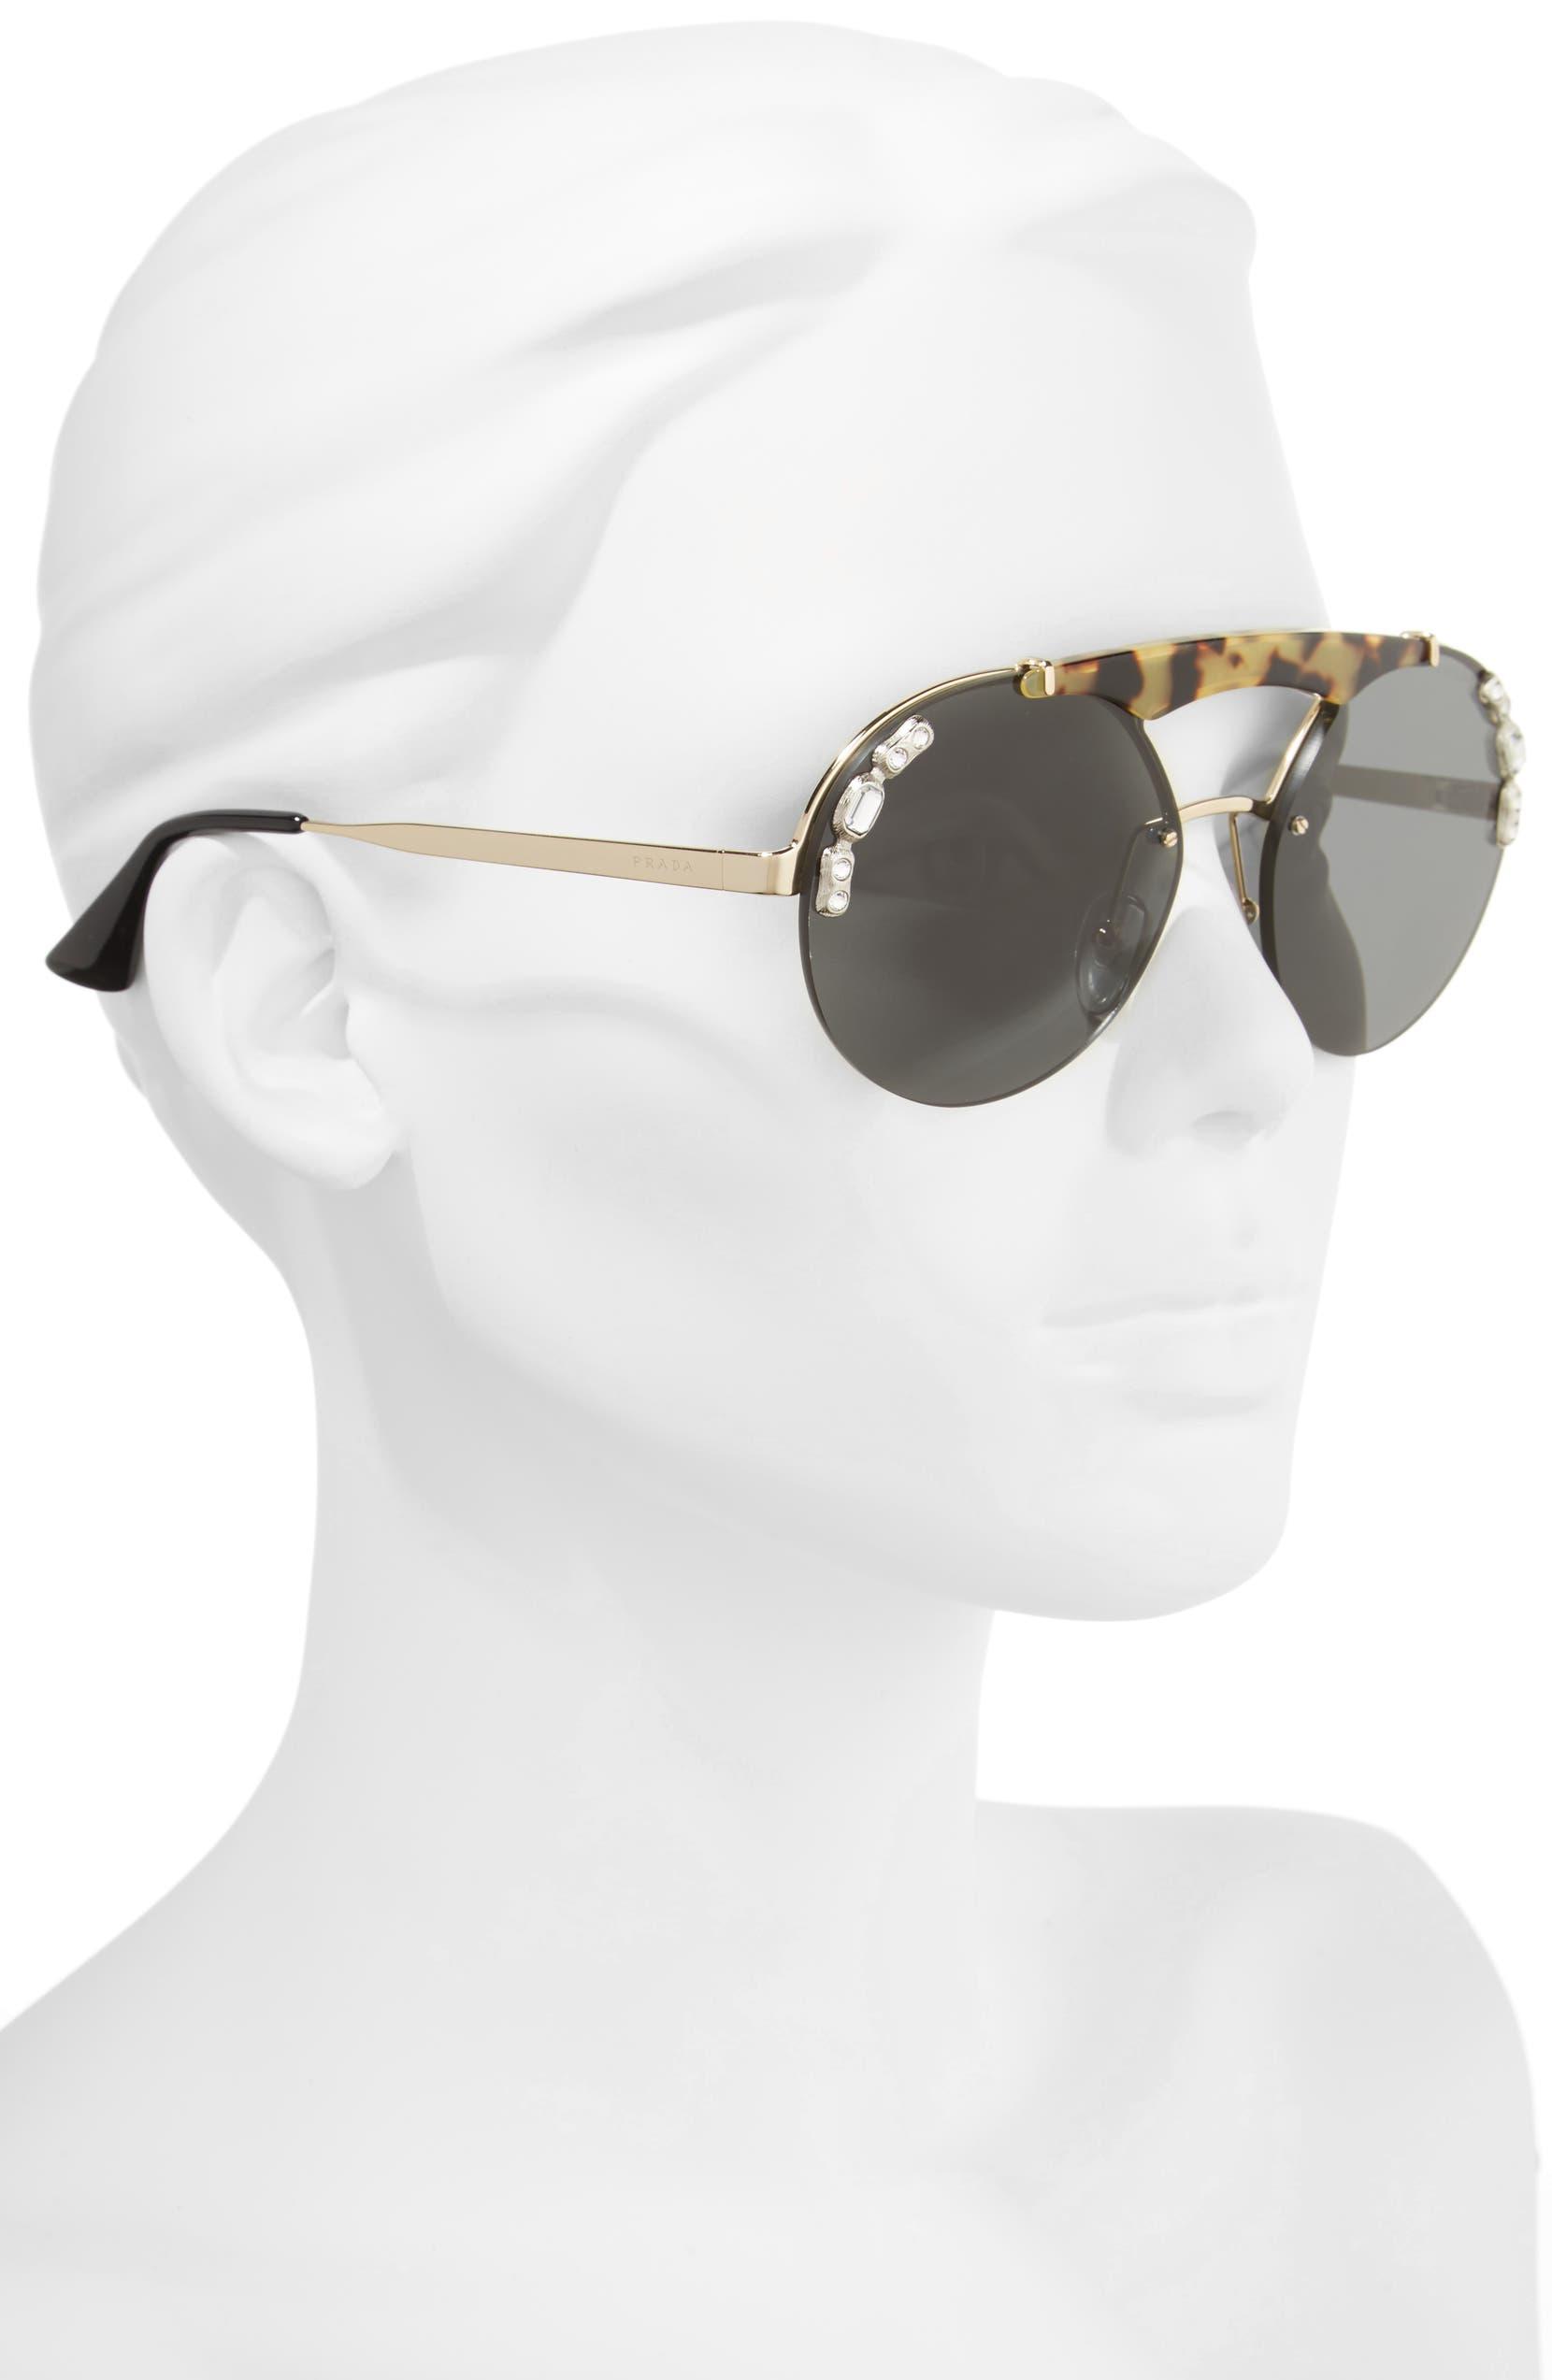 ce081fbcc8 Prada 52mm Embellished Round Rimless Sunglasses